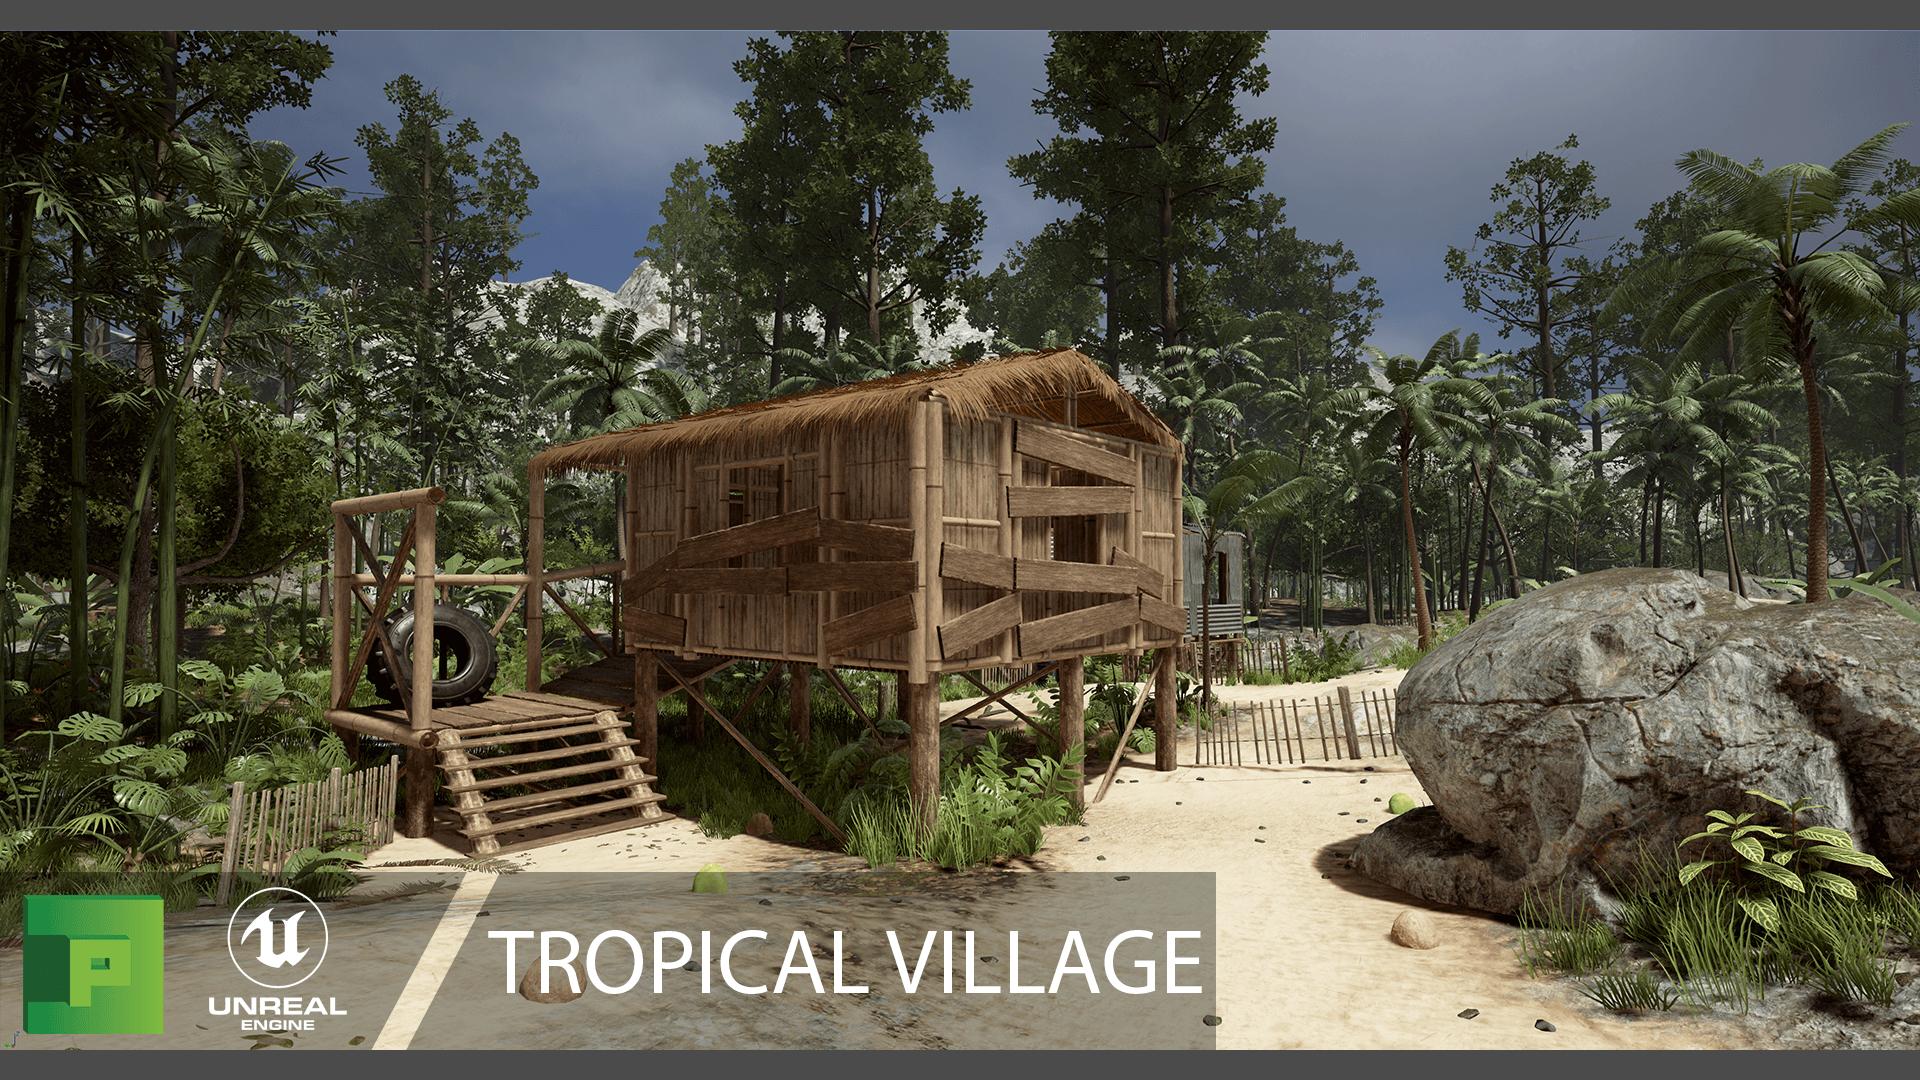 TropicalVillage_01